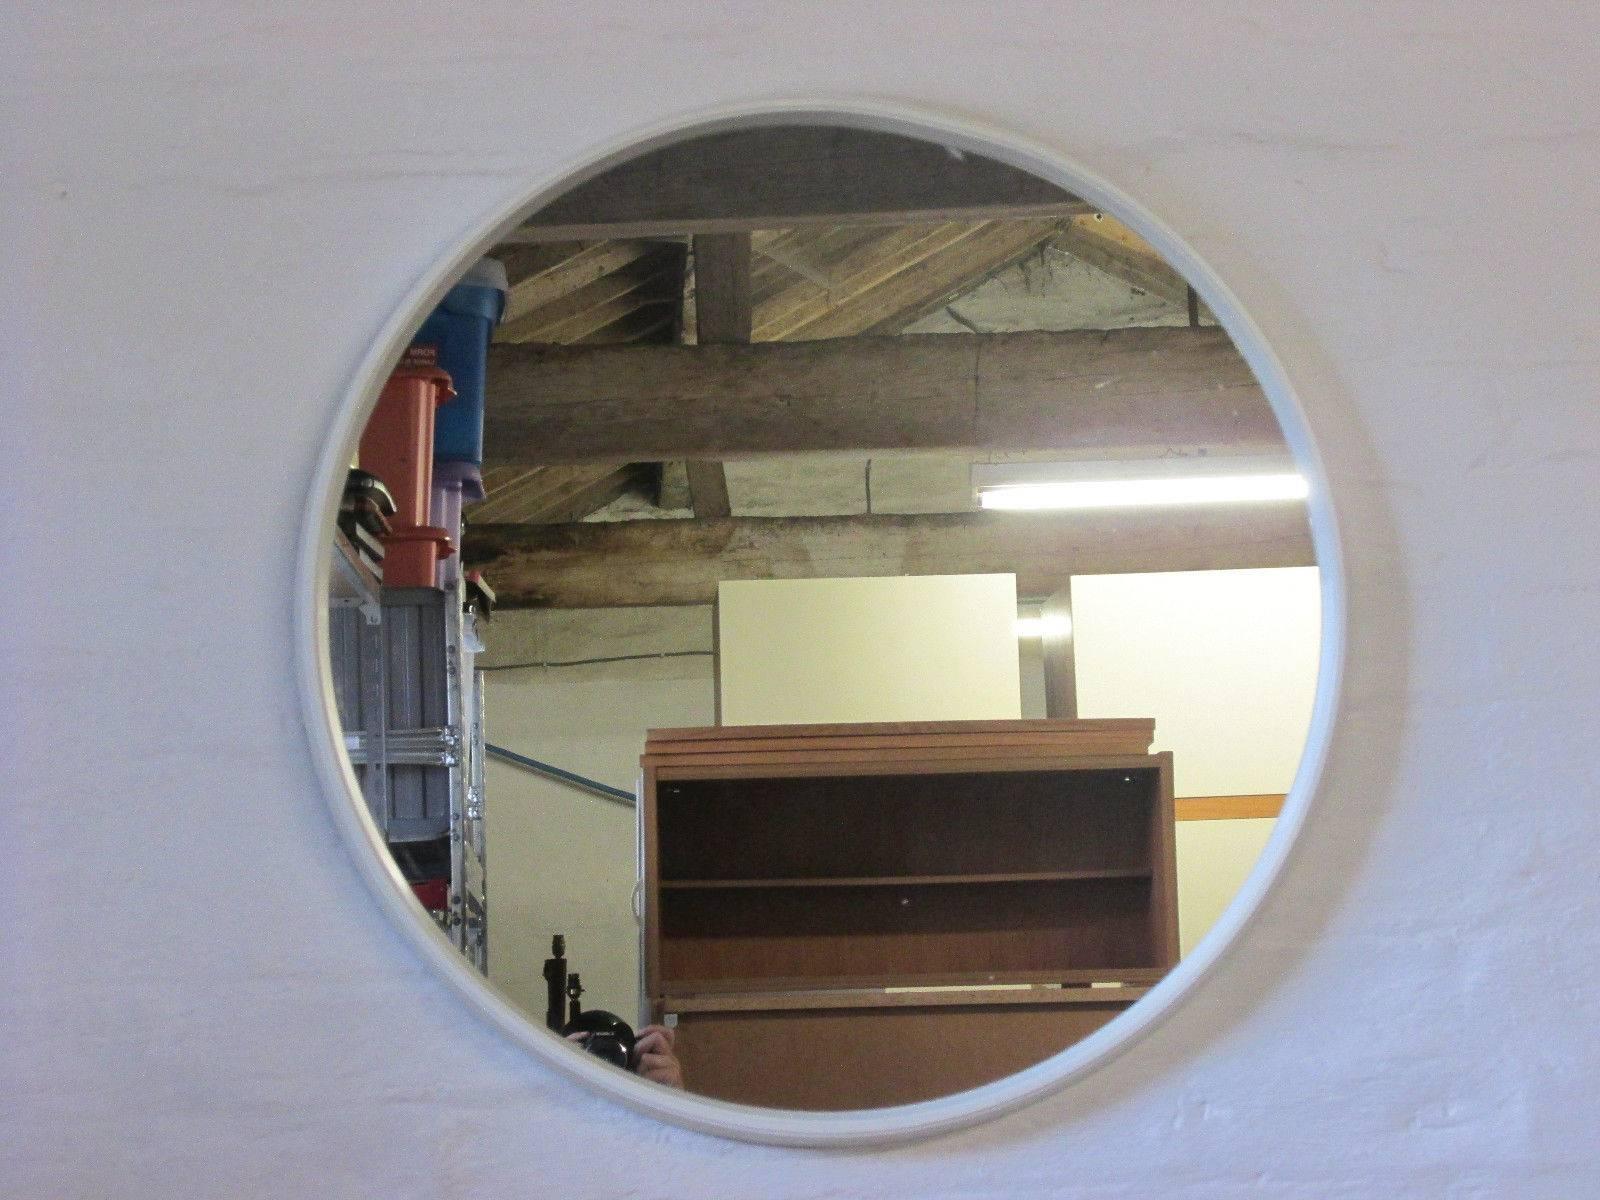 Retro 1960S/1970S Schreiber Nova Round White Framed Wall Mirror with regard to Retro Wall Mirrors (Image 18 of 25)